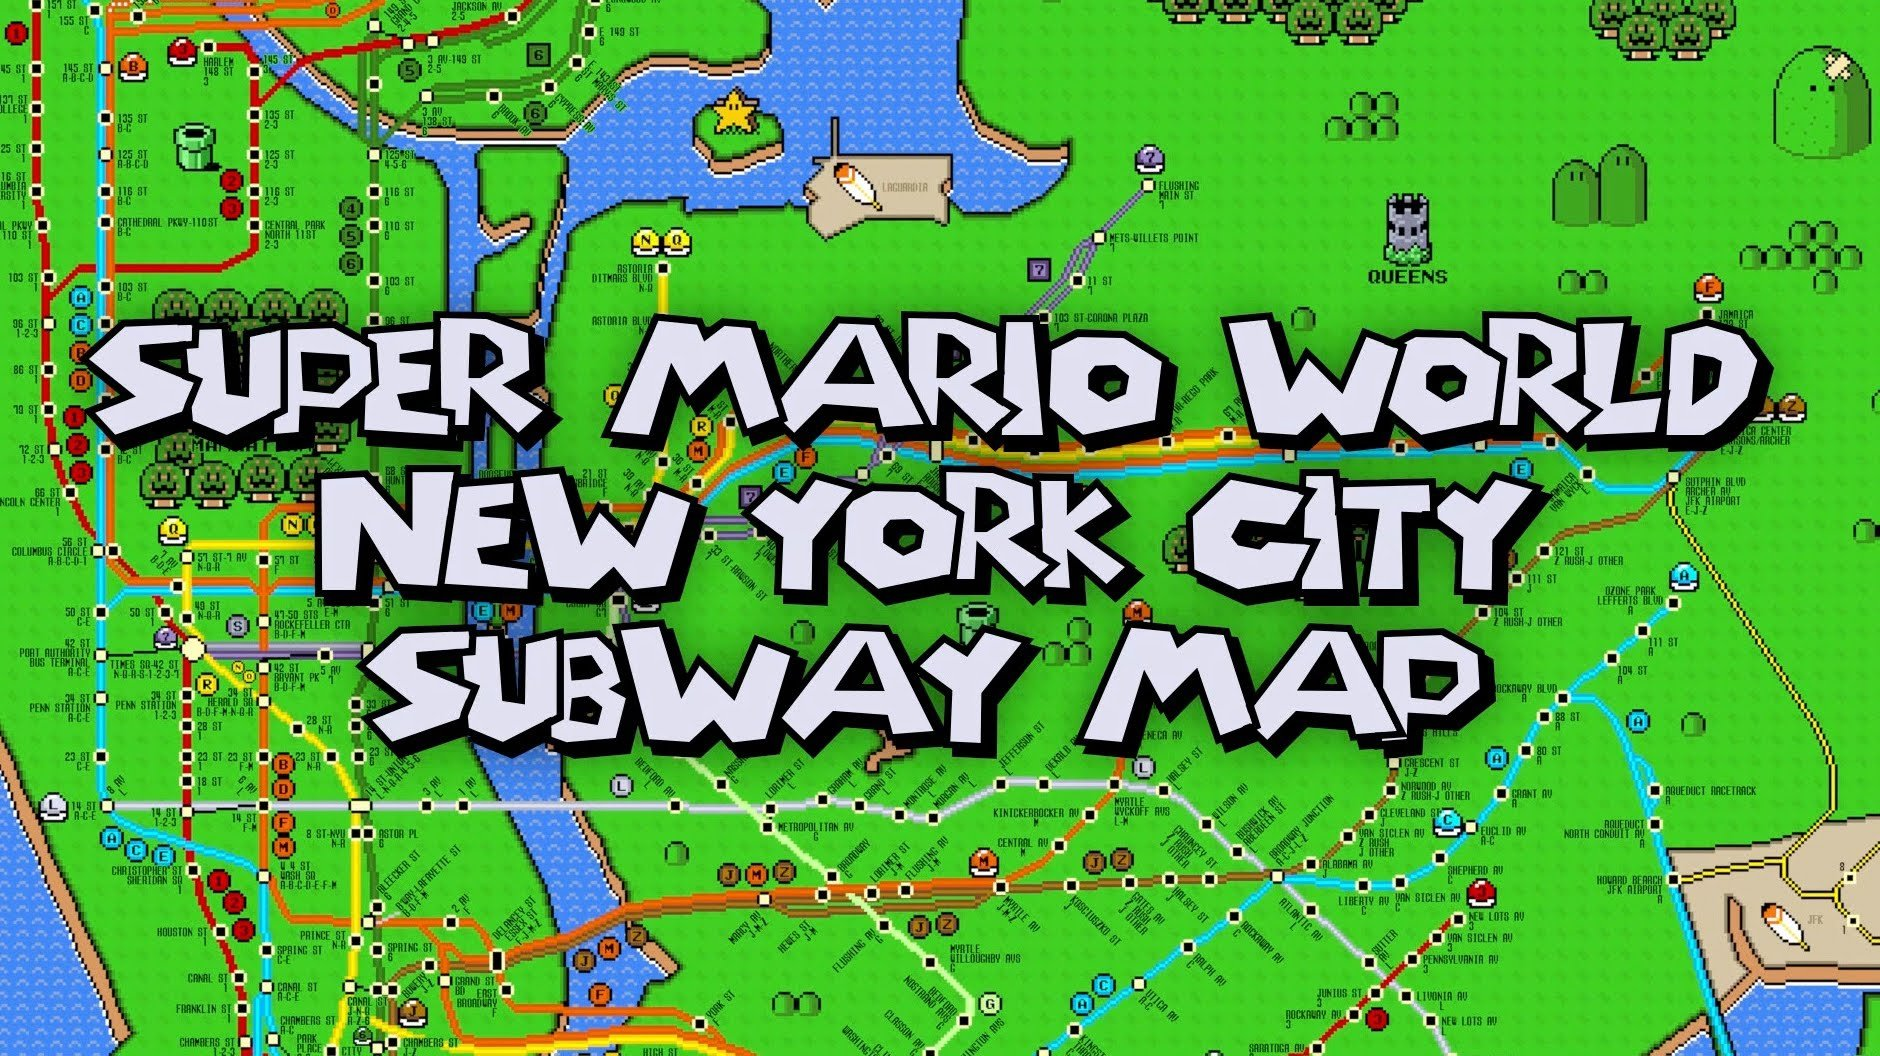 Super mario new york city subway map underworld 1 1 technabob gumiabroncs Gallery